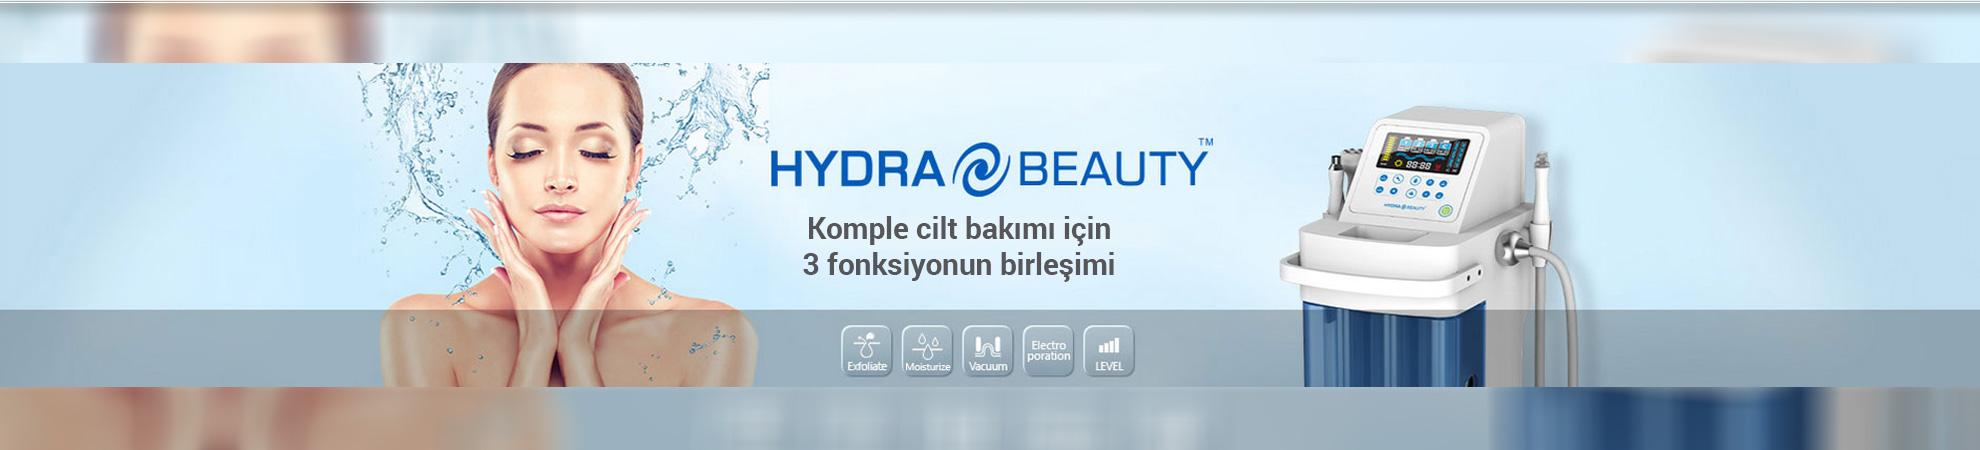 hydra-beauty-banner